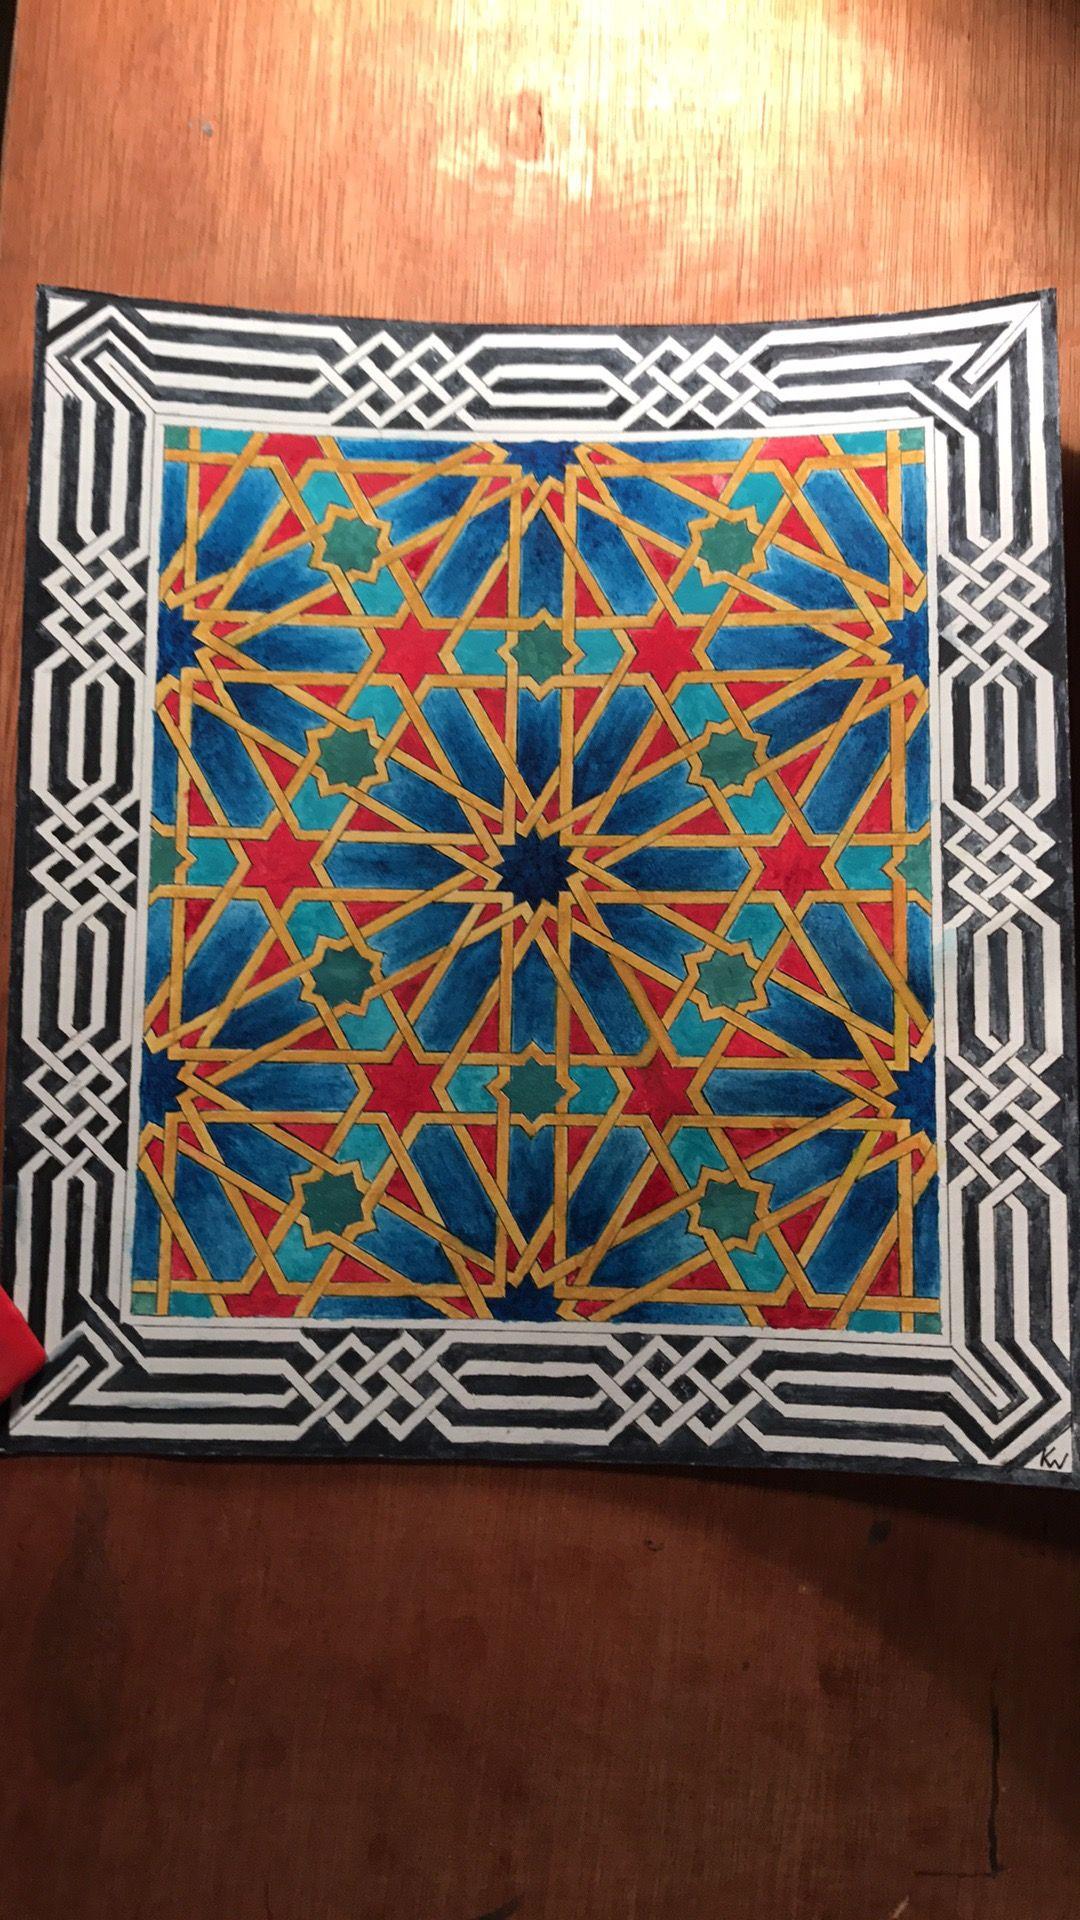 Islamic Tiles, Islamic Art, Moroccan Design, Tile Design, Geometric Patterns,